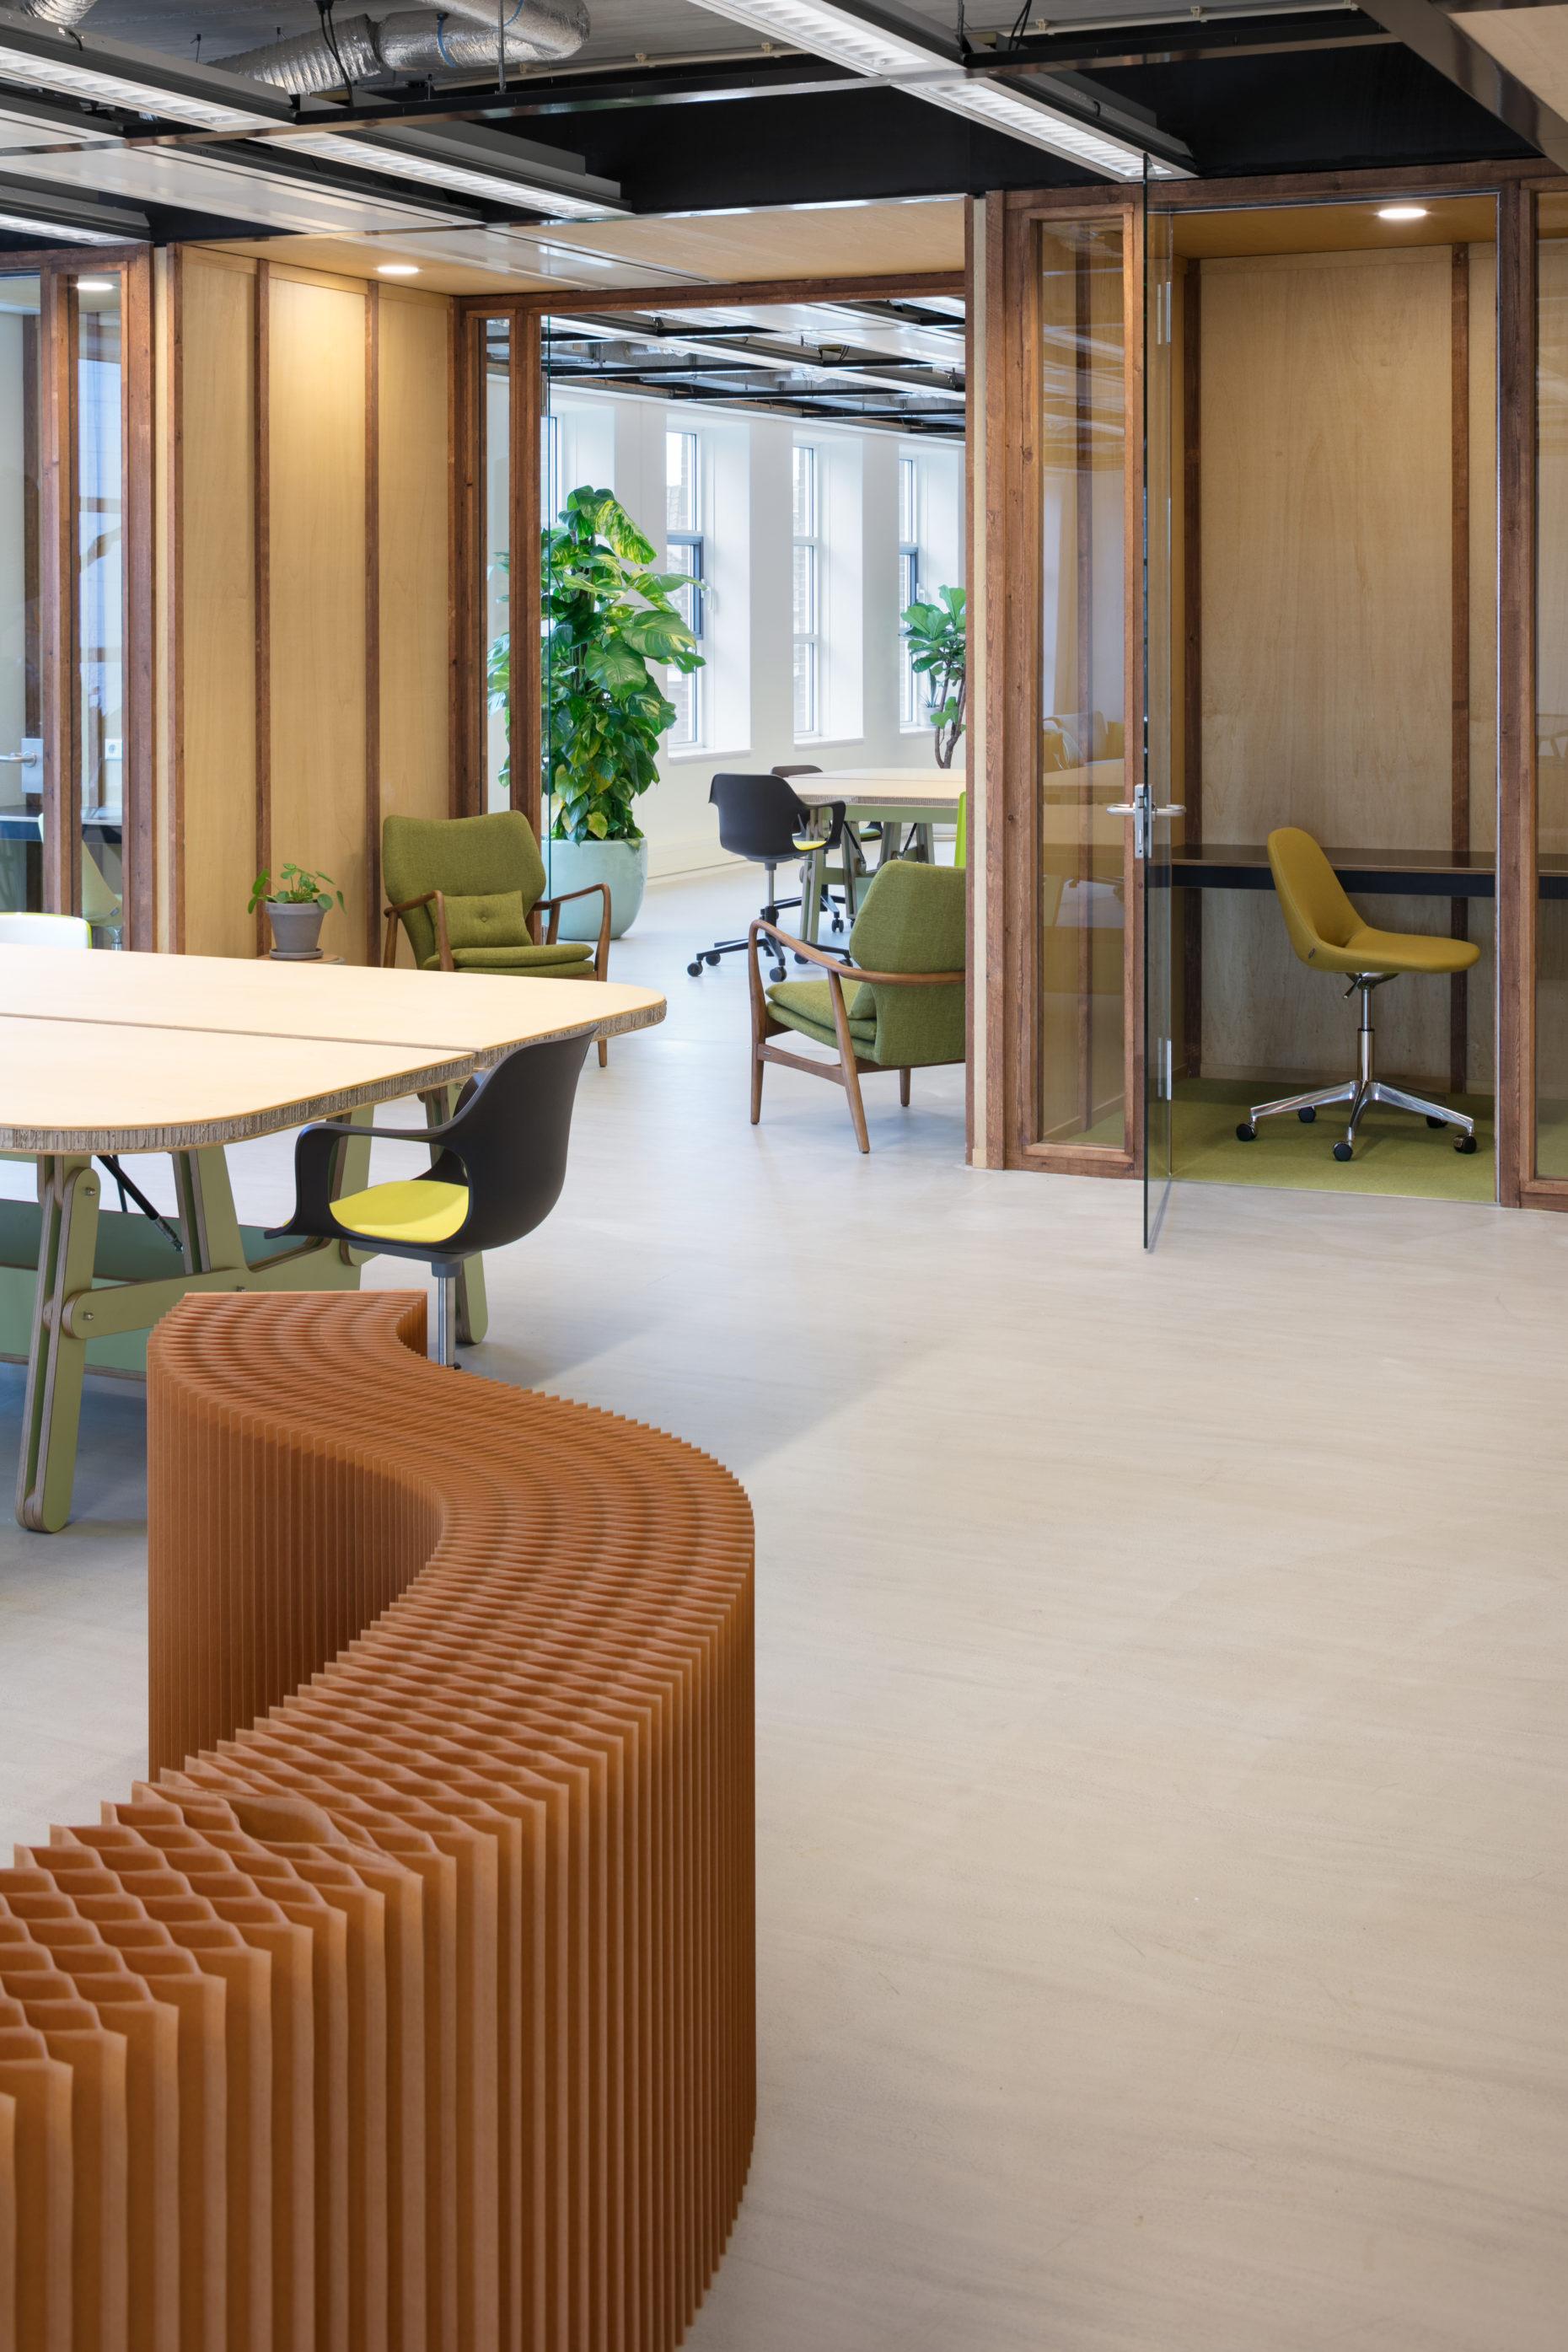 Duurzaam kantoor interieur – KnE+